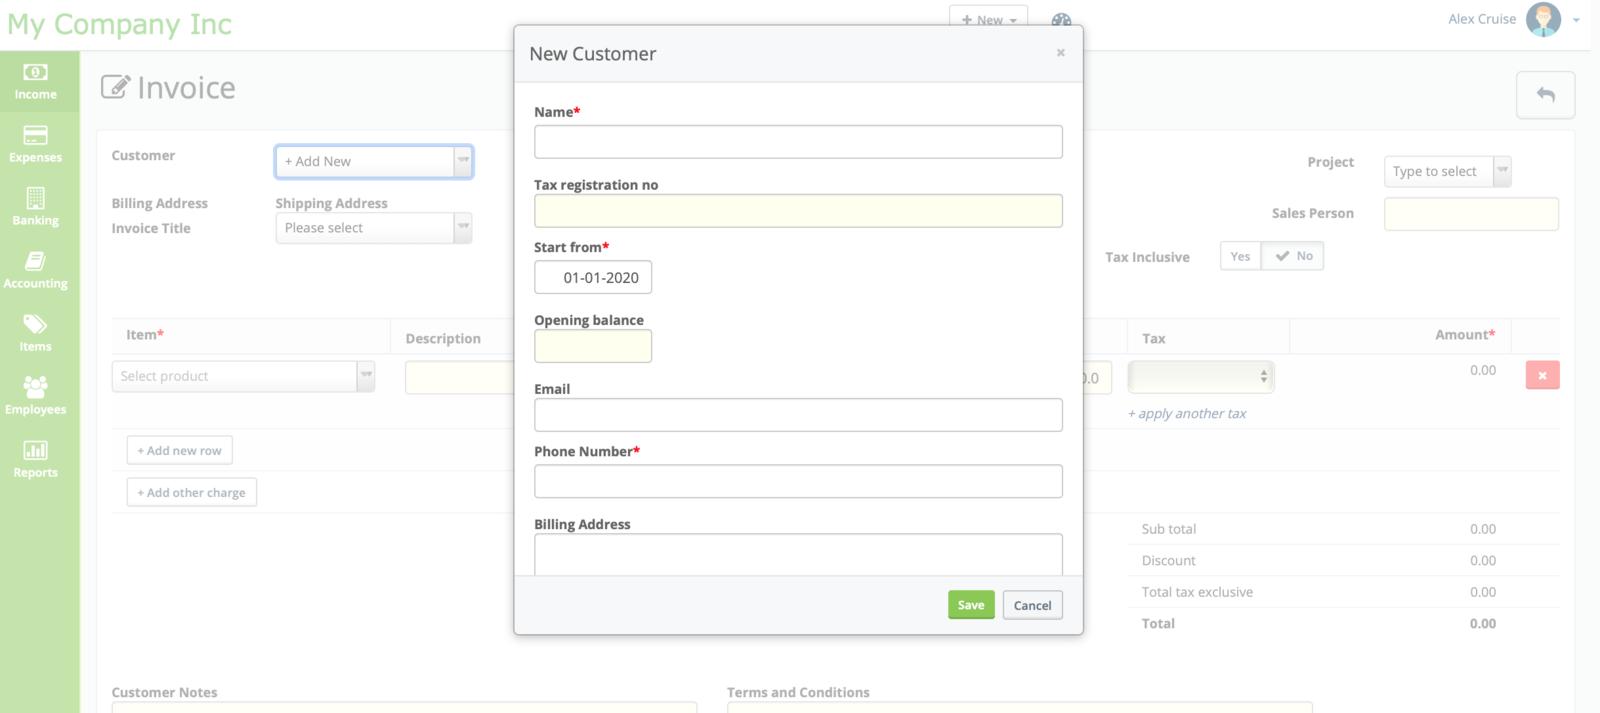 New customer creation window